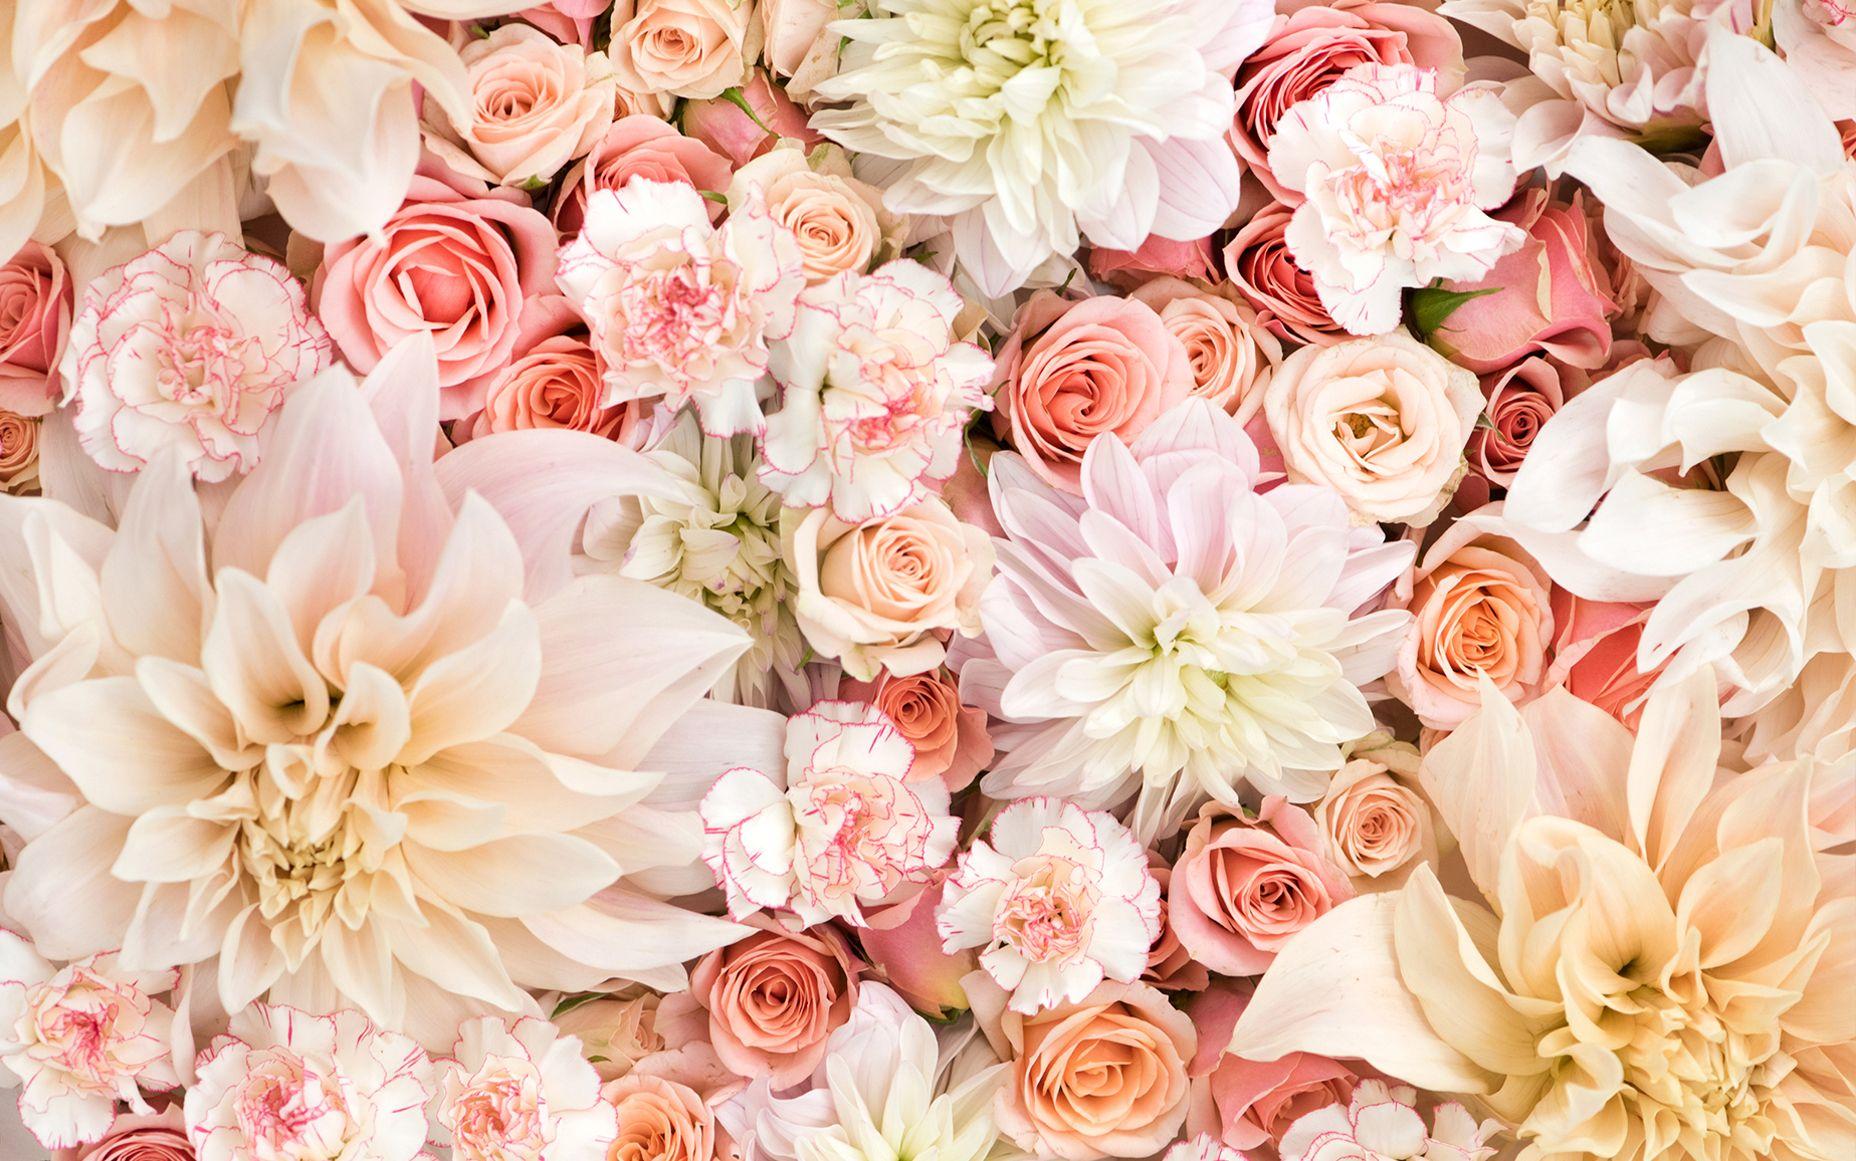 Pink peach coral blush cream floral flowers blooms desktop